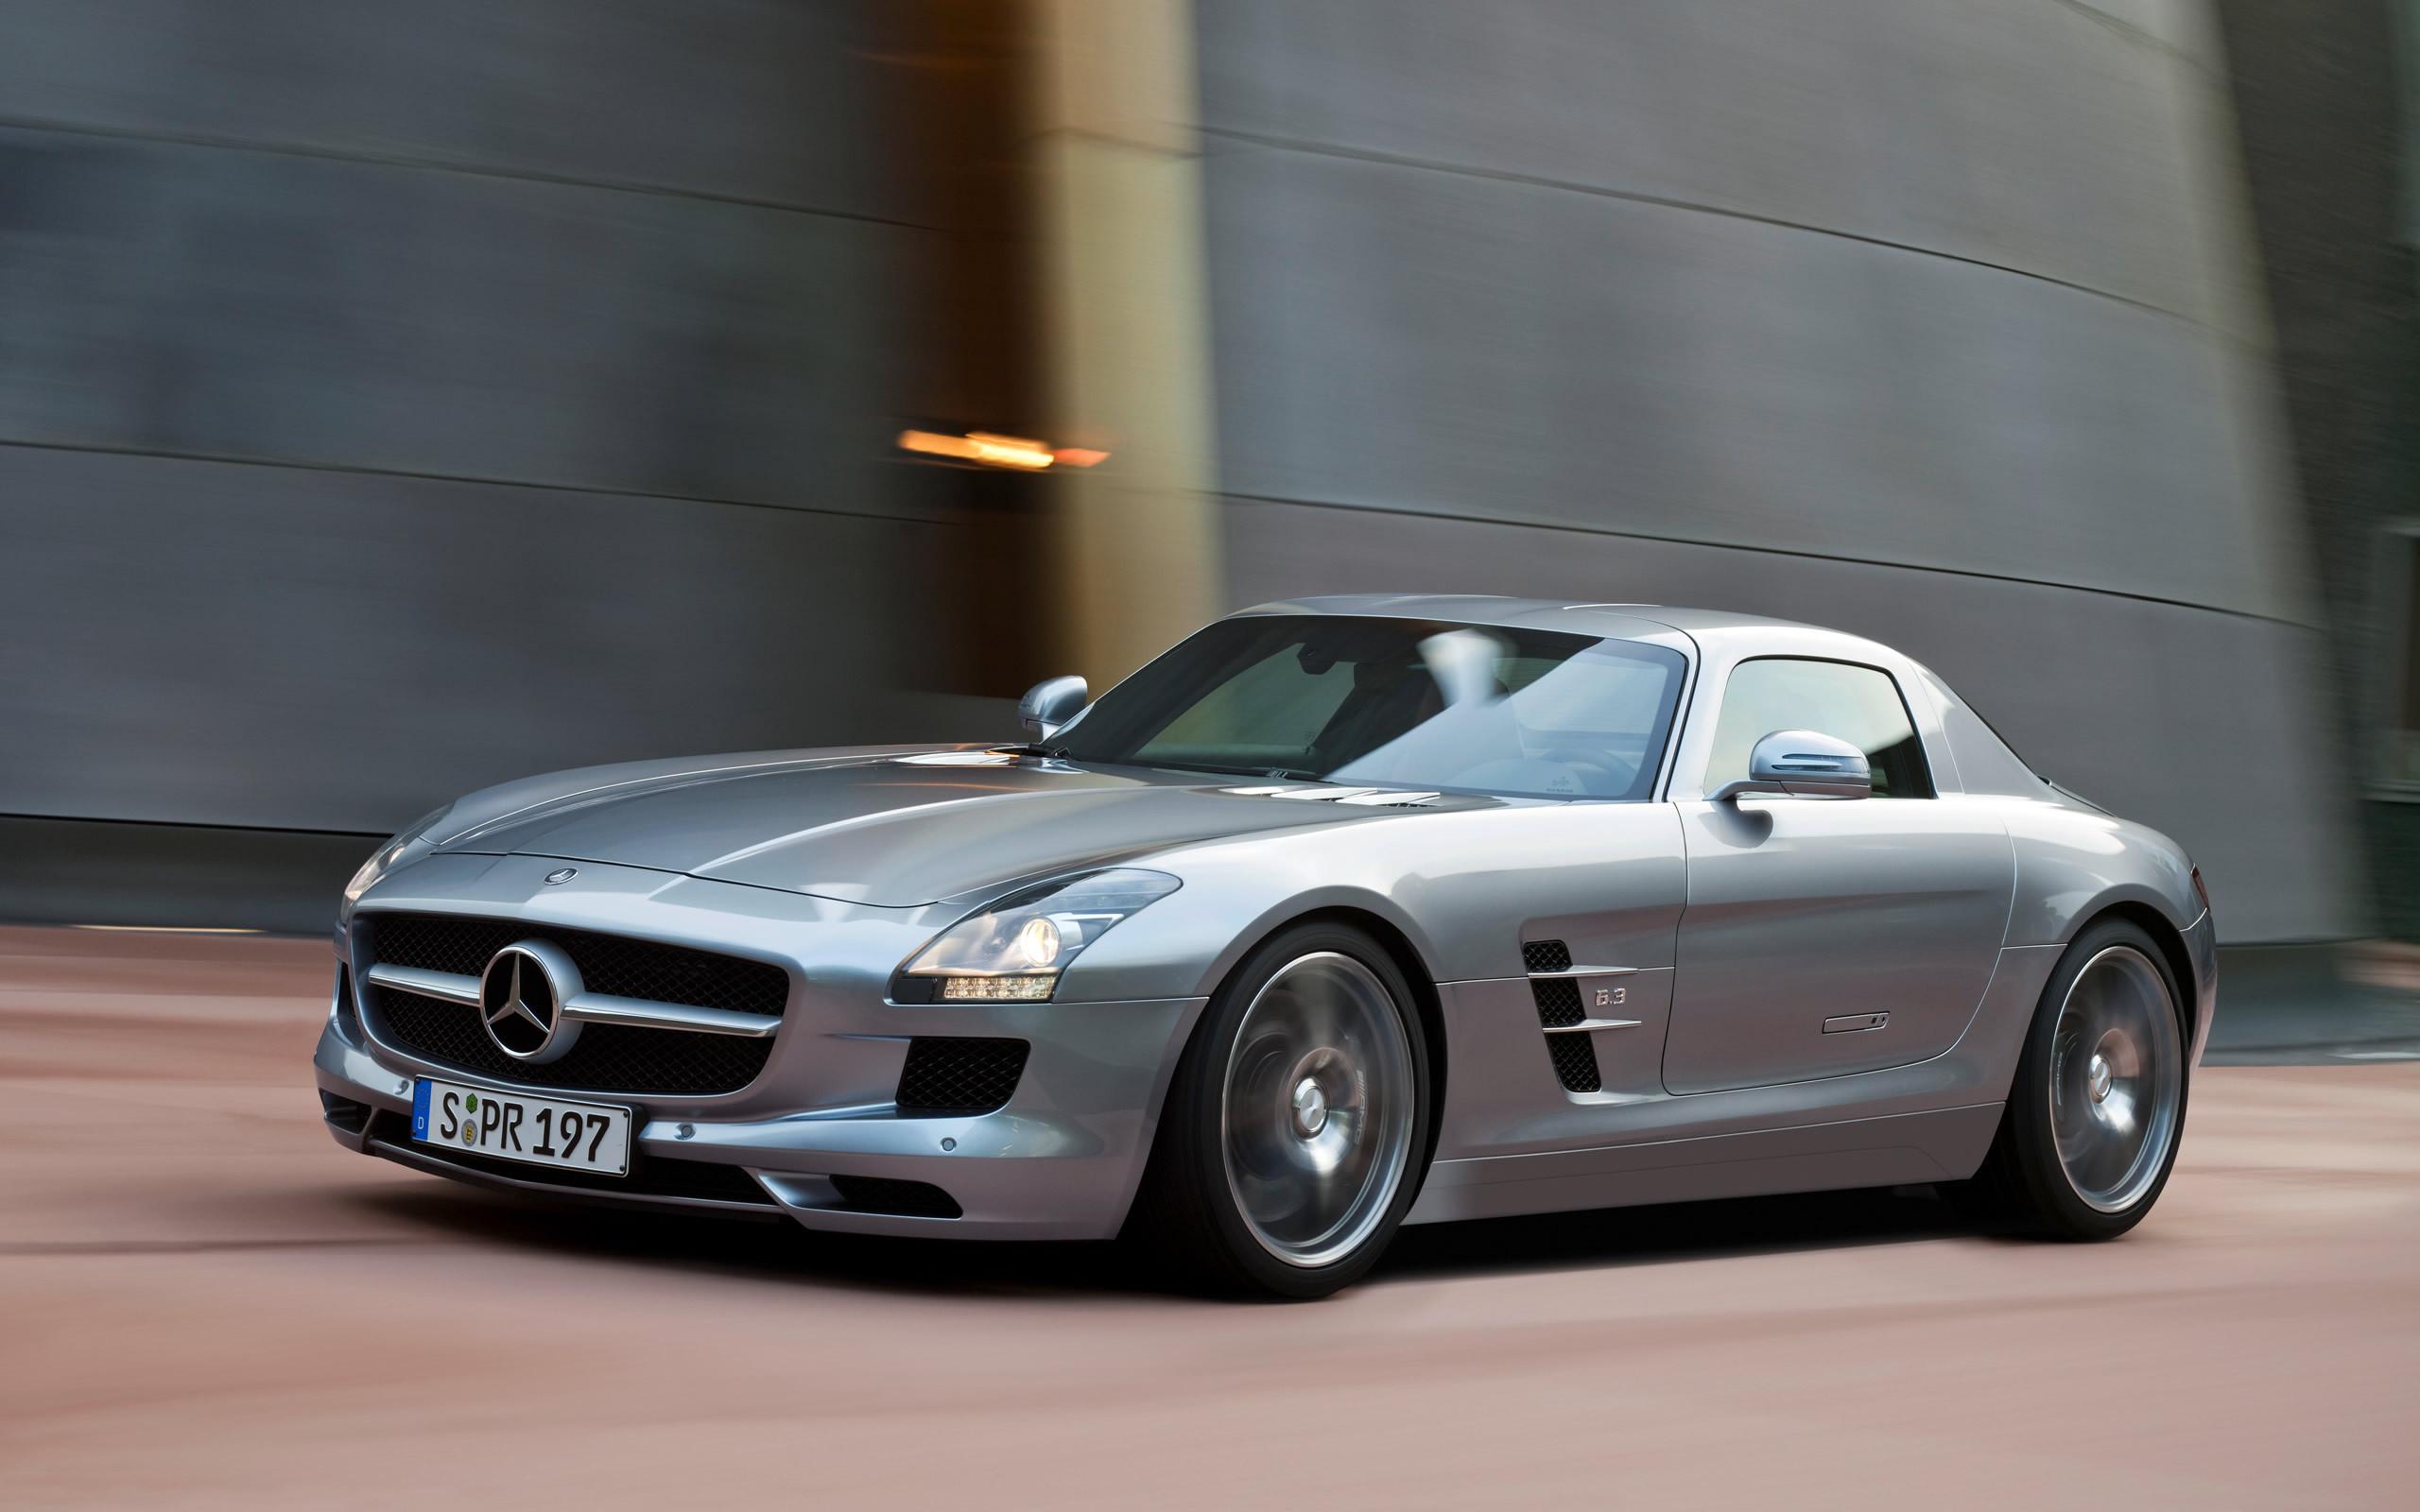 Autos Mercedes-Benz - Autos - Tweedehandsnet